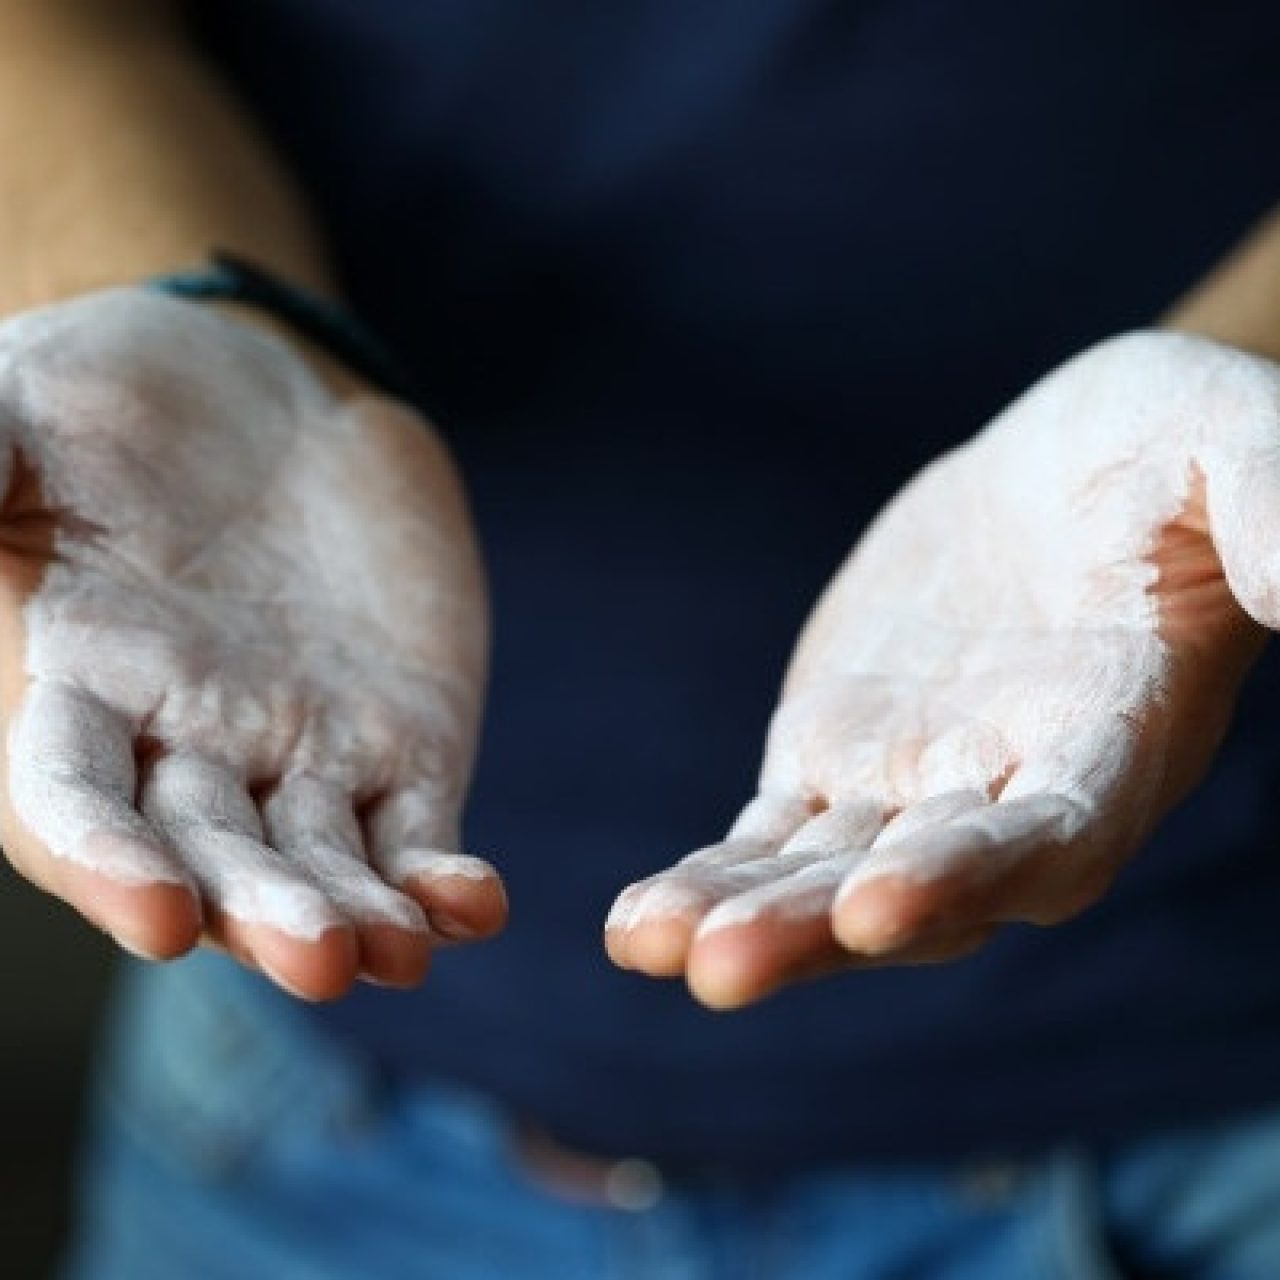 manos-masculinas-untadas-polvo-magnesio-listo-entrenar-primer-plano_151013-7479